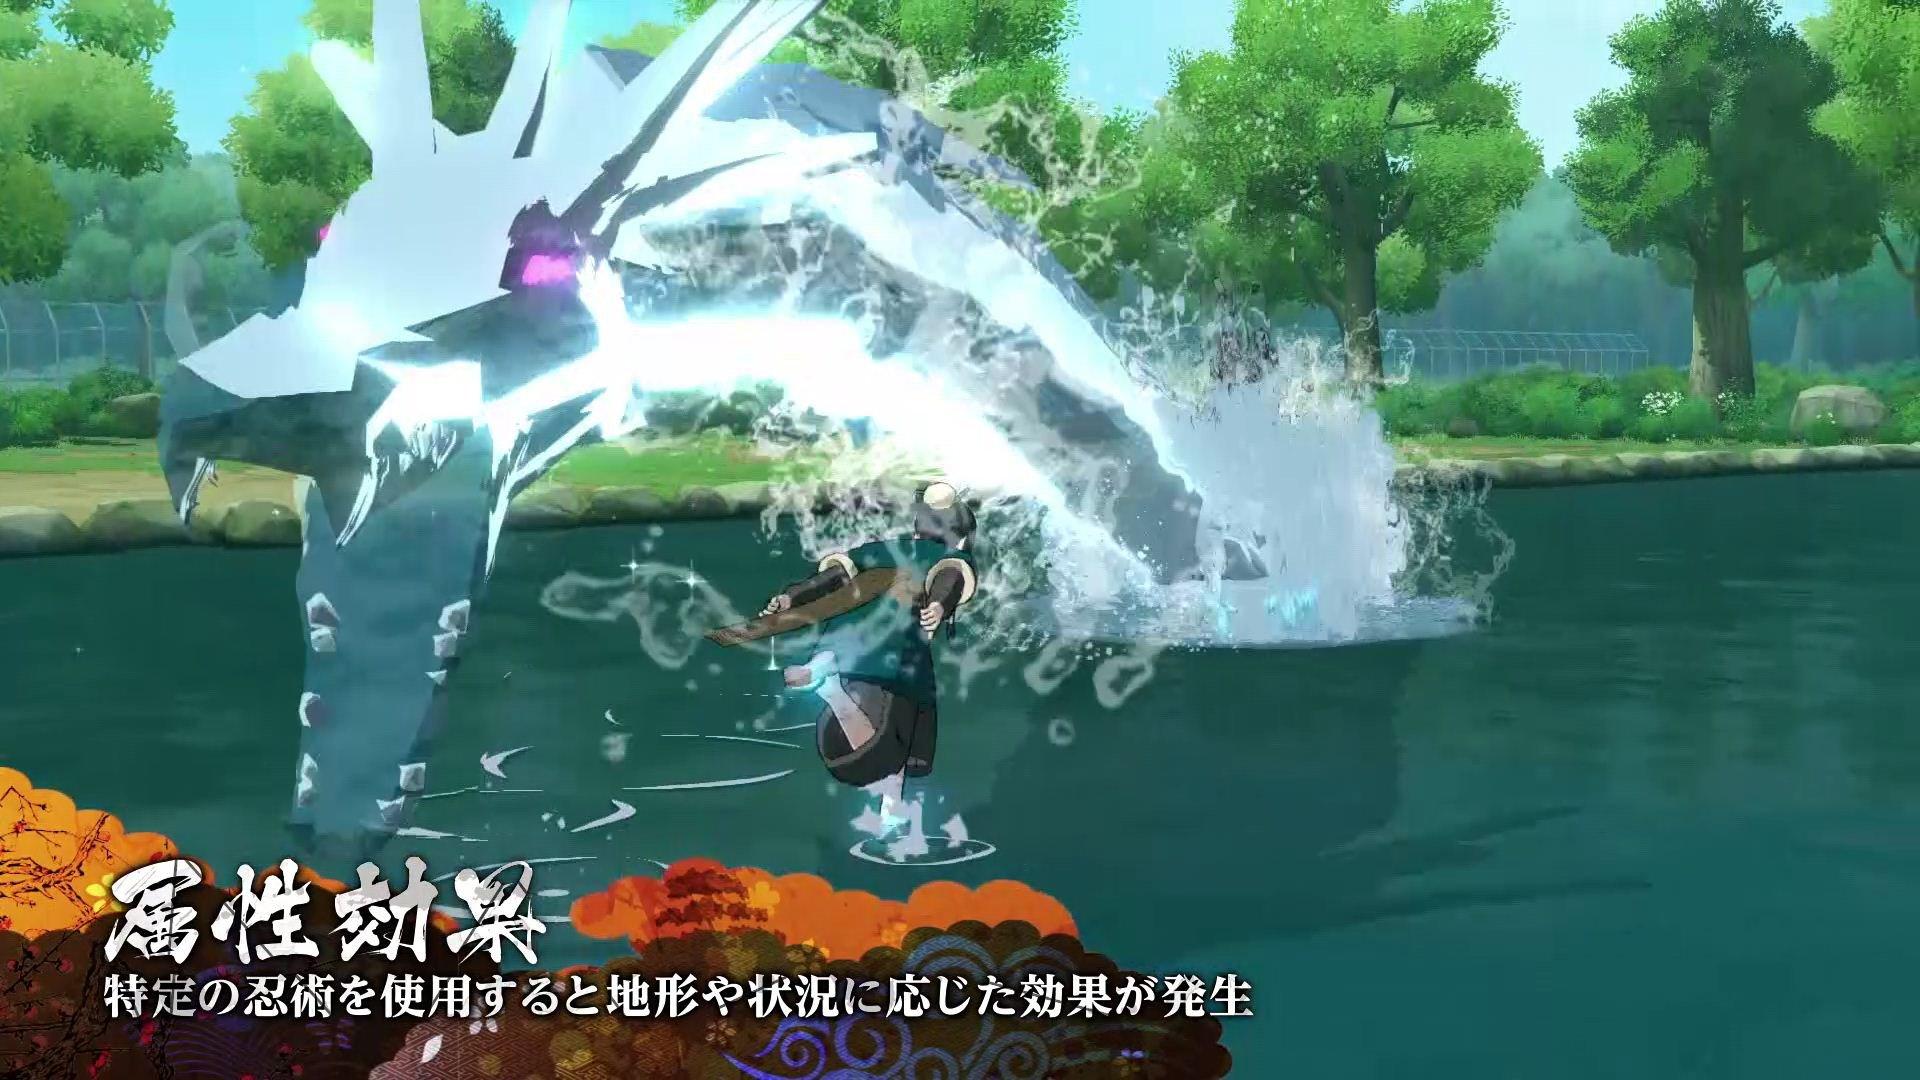 Naruto Shippuden Ultimate Ninja Storm 4 para PC - 3DJuegos